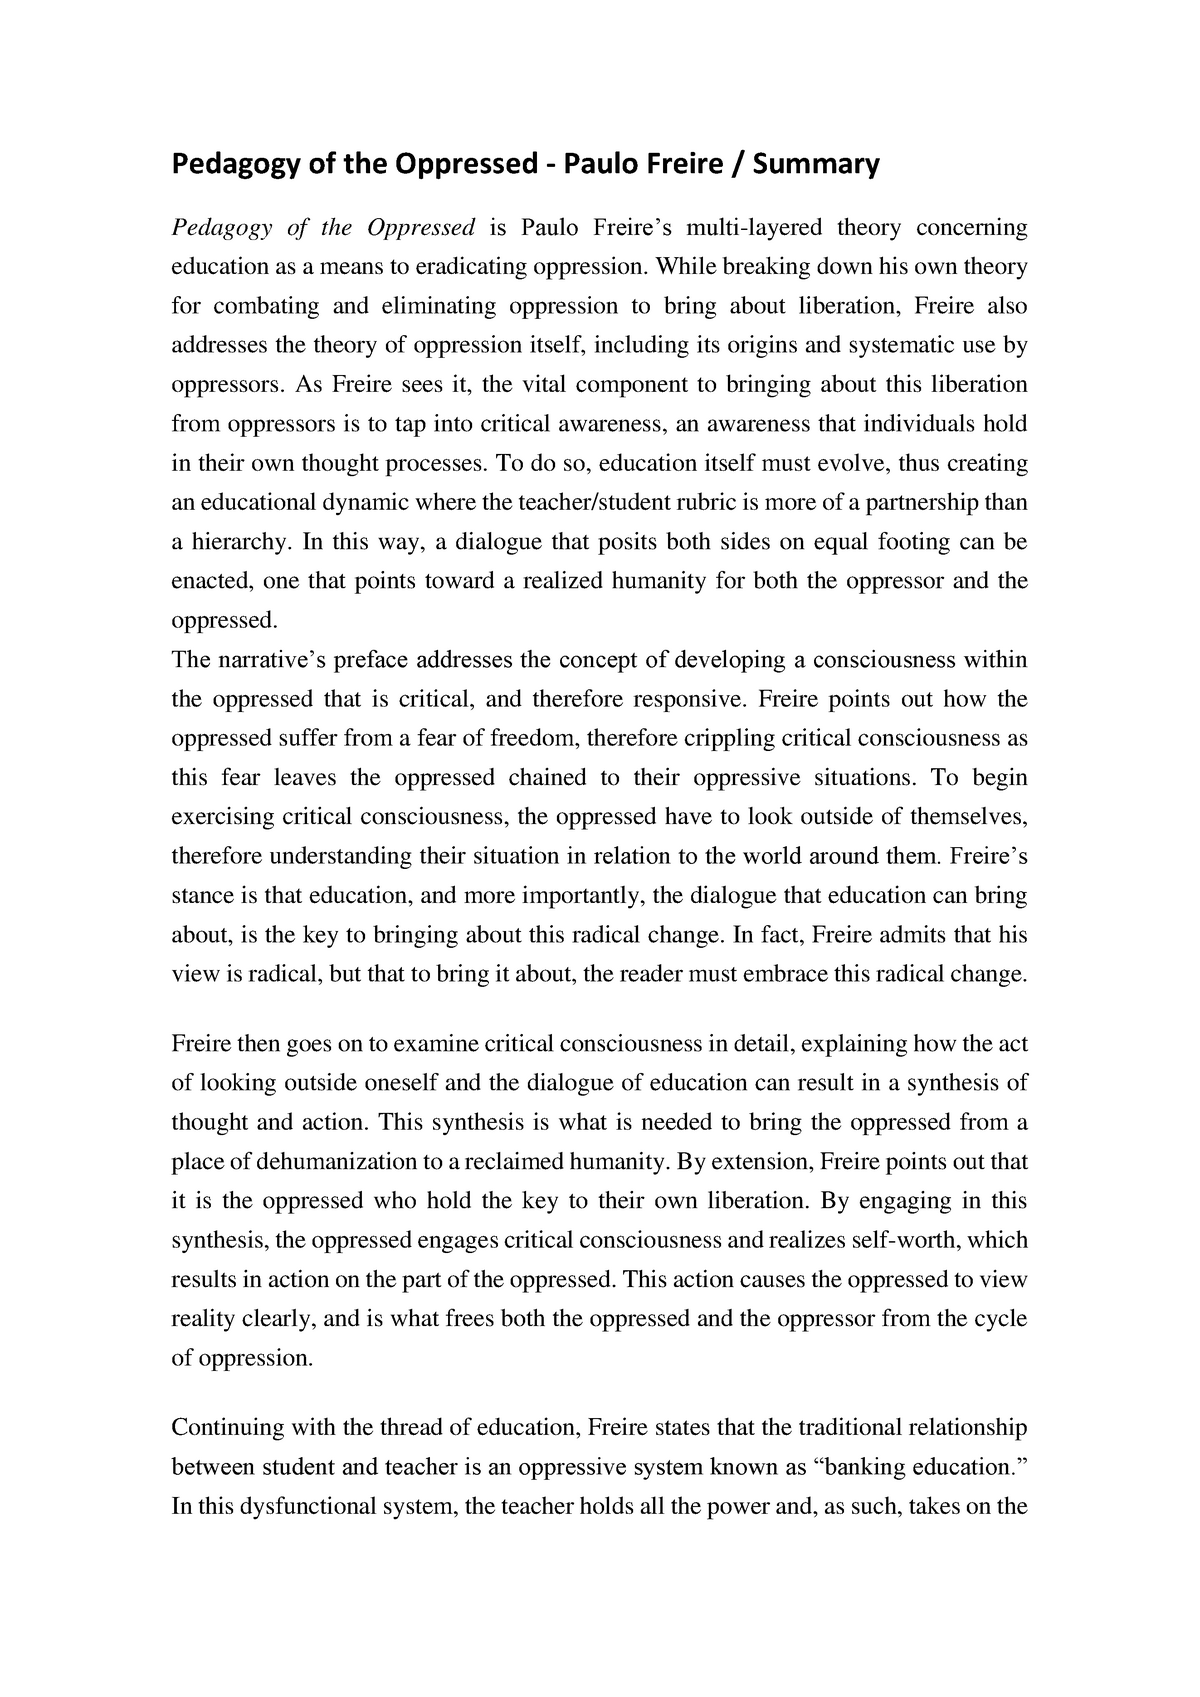 pedagogy of the oppressed essay